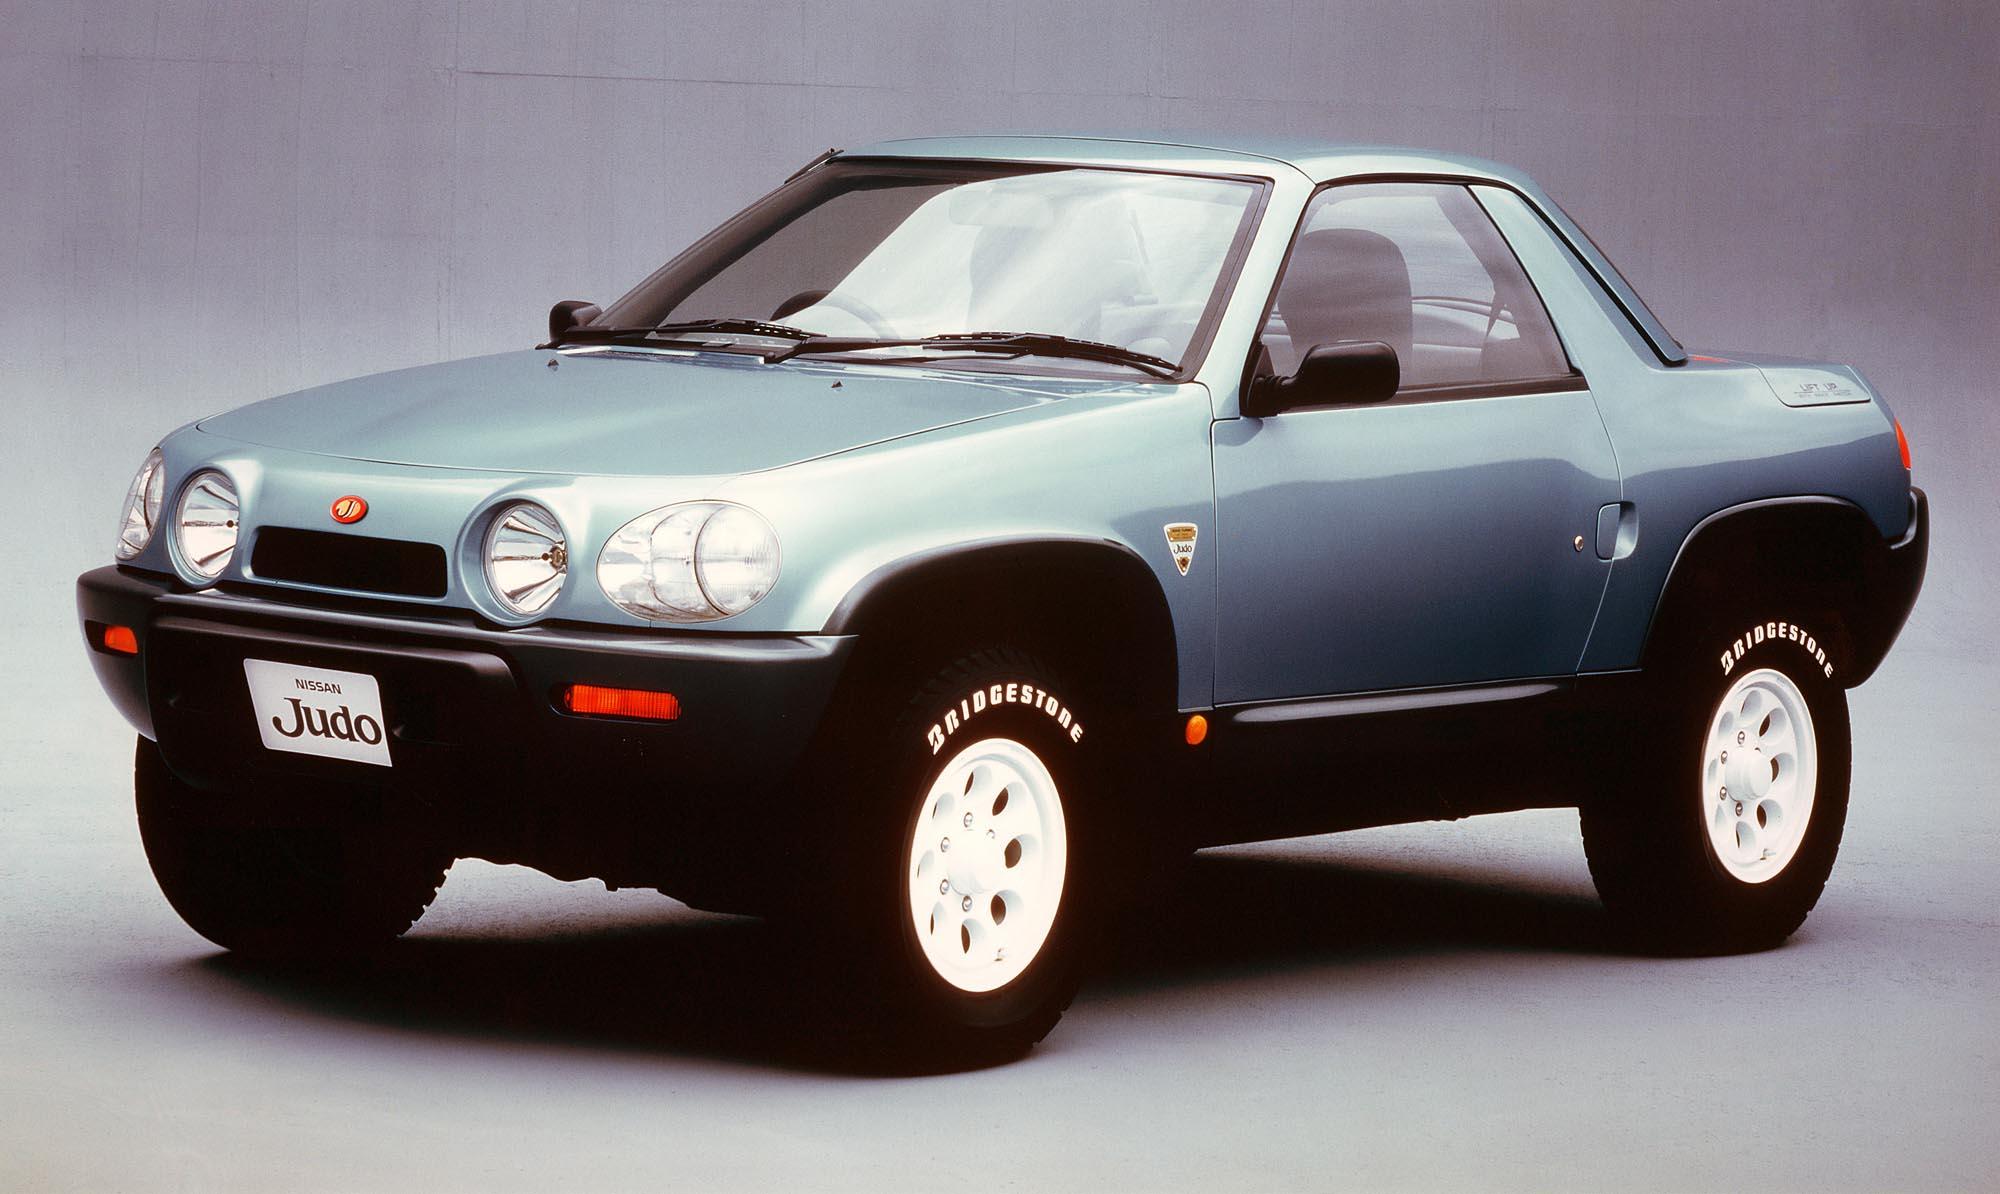 1987 Nissan Judo Concepts